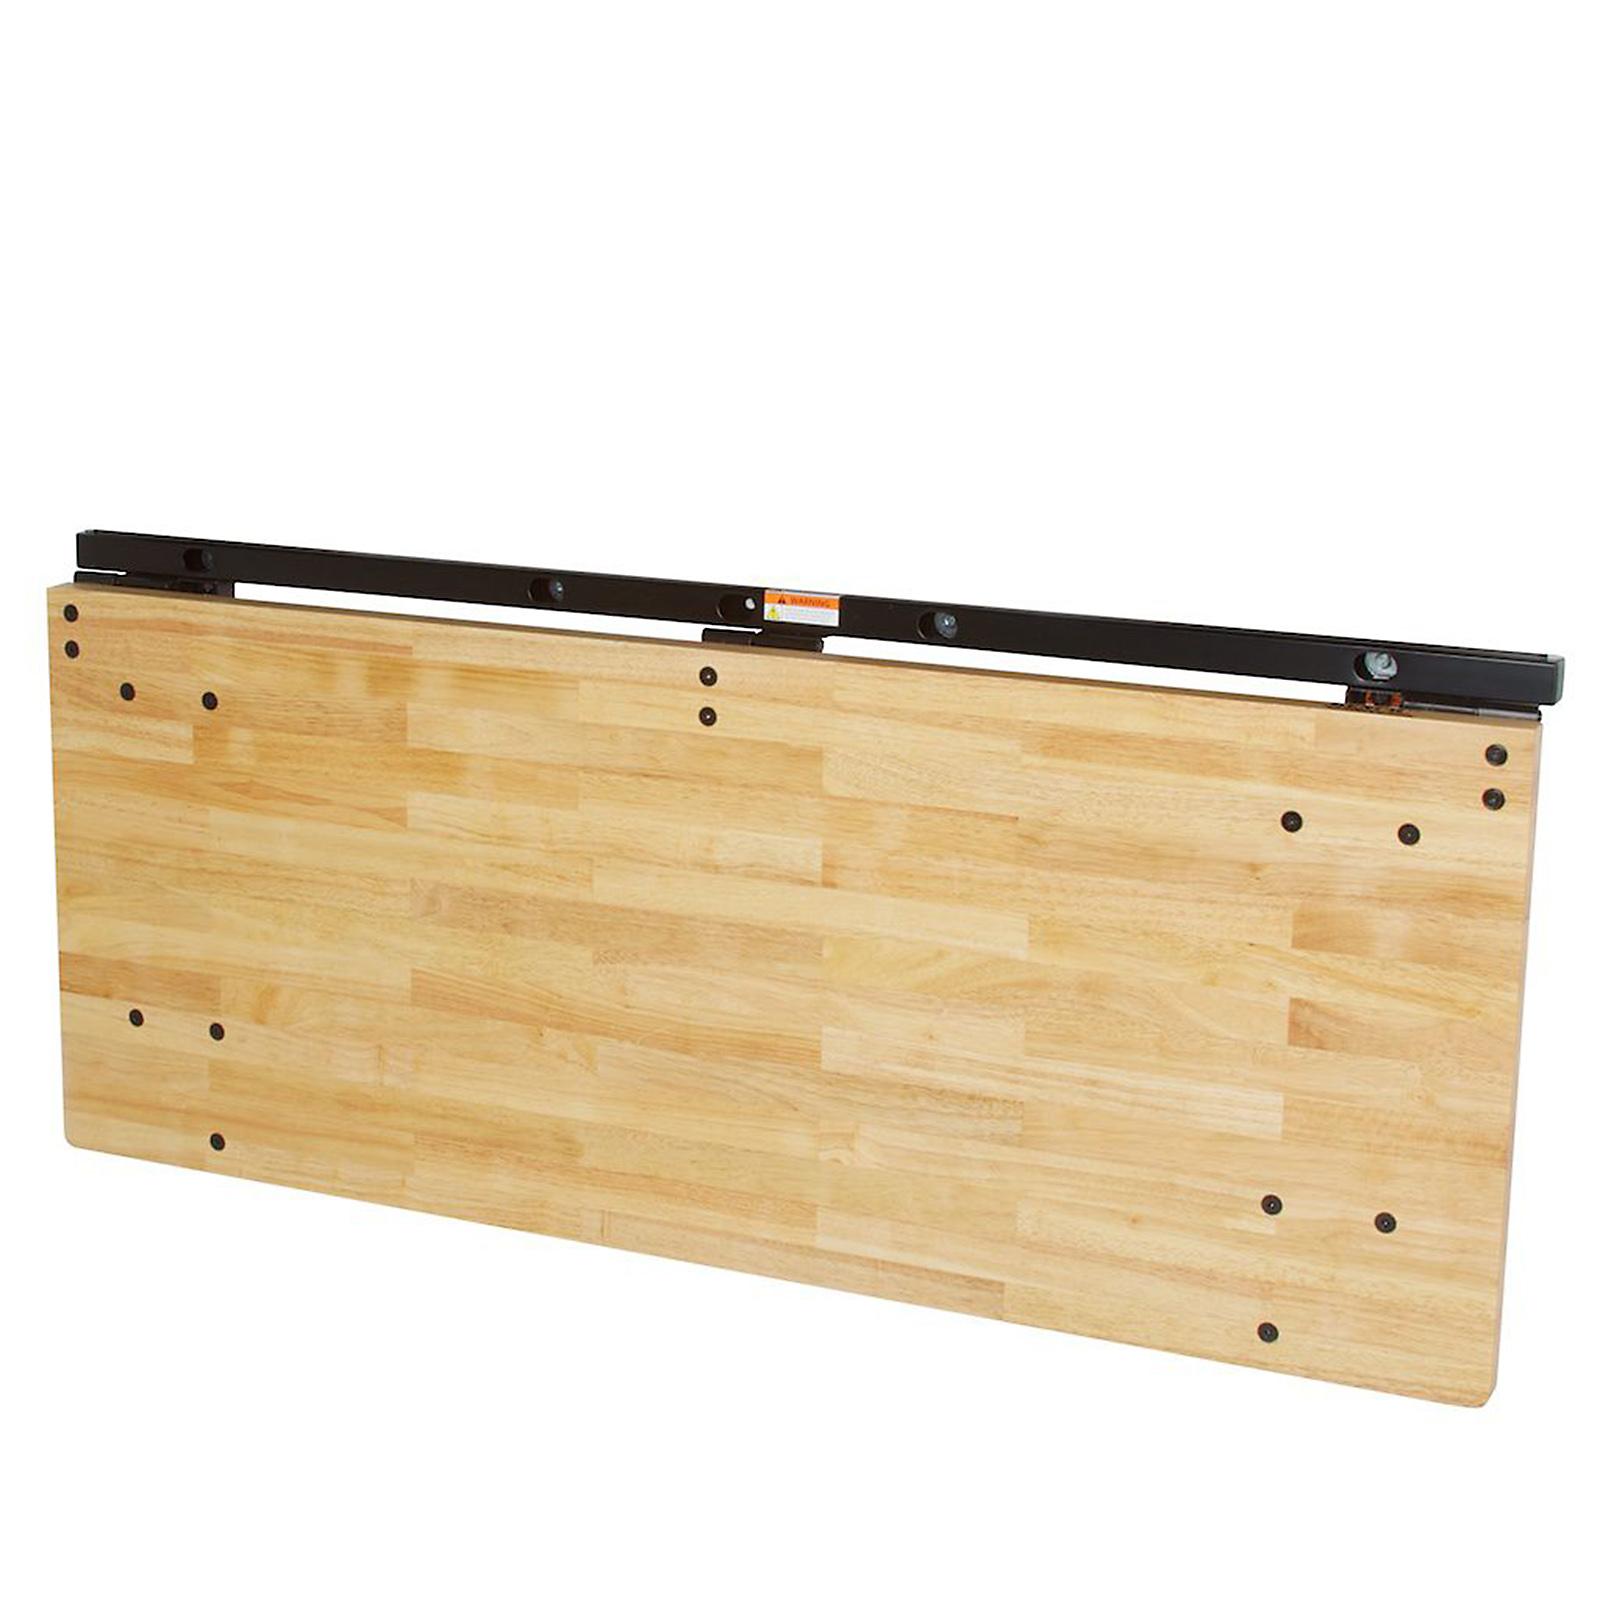 Ideal Wall Mount Workbench